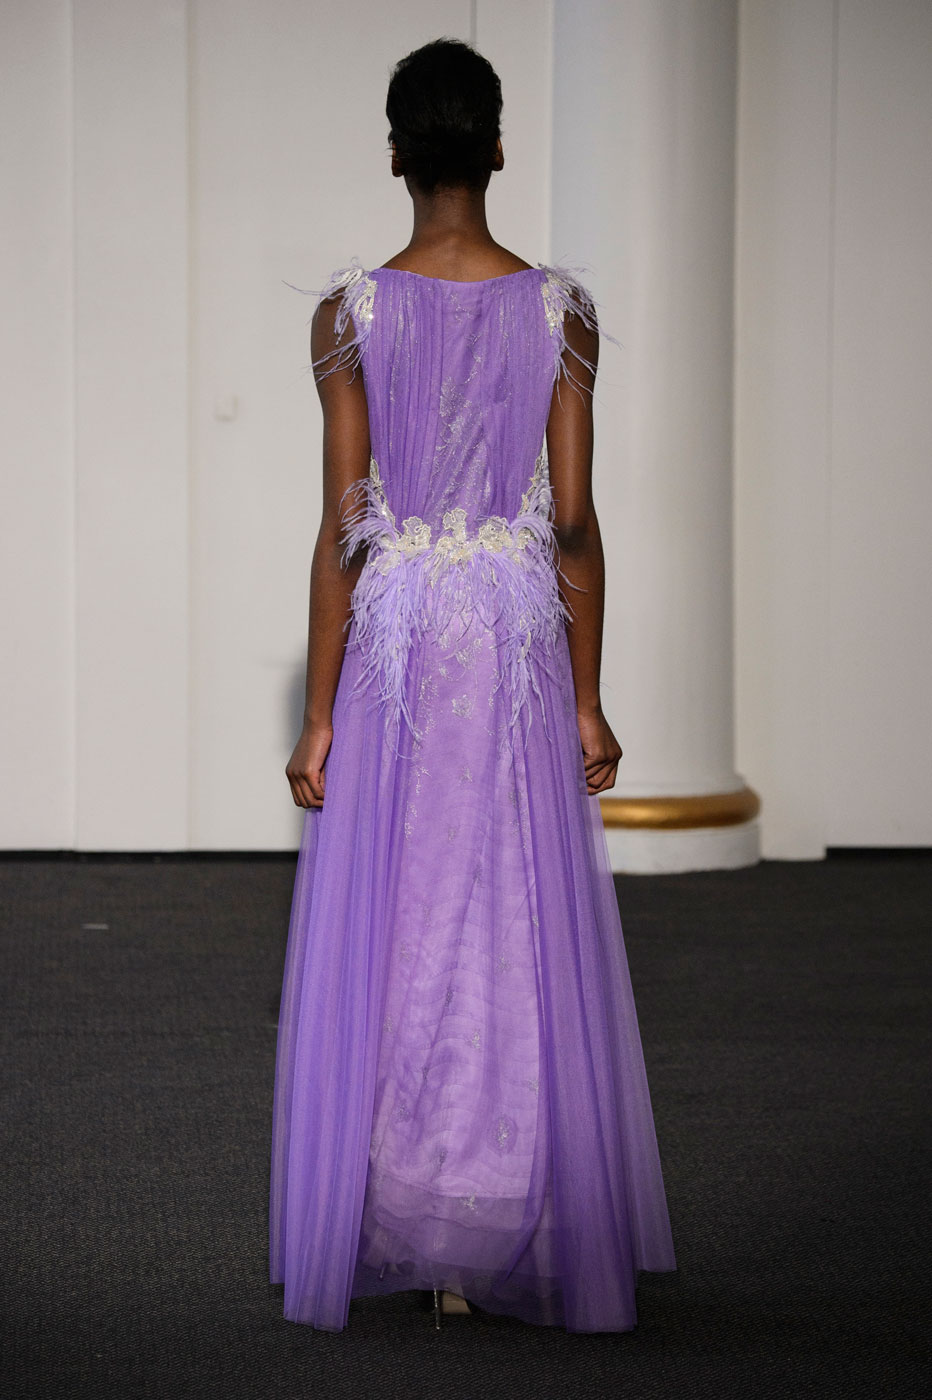 Busardi-fashion-runway-show-haute-couture-paris-spring-2015-the-impression-57